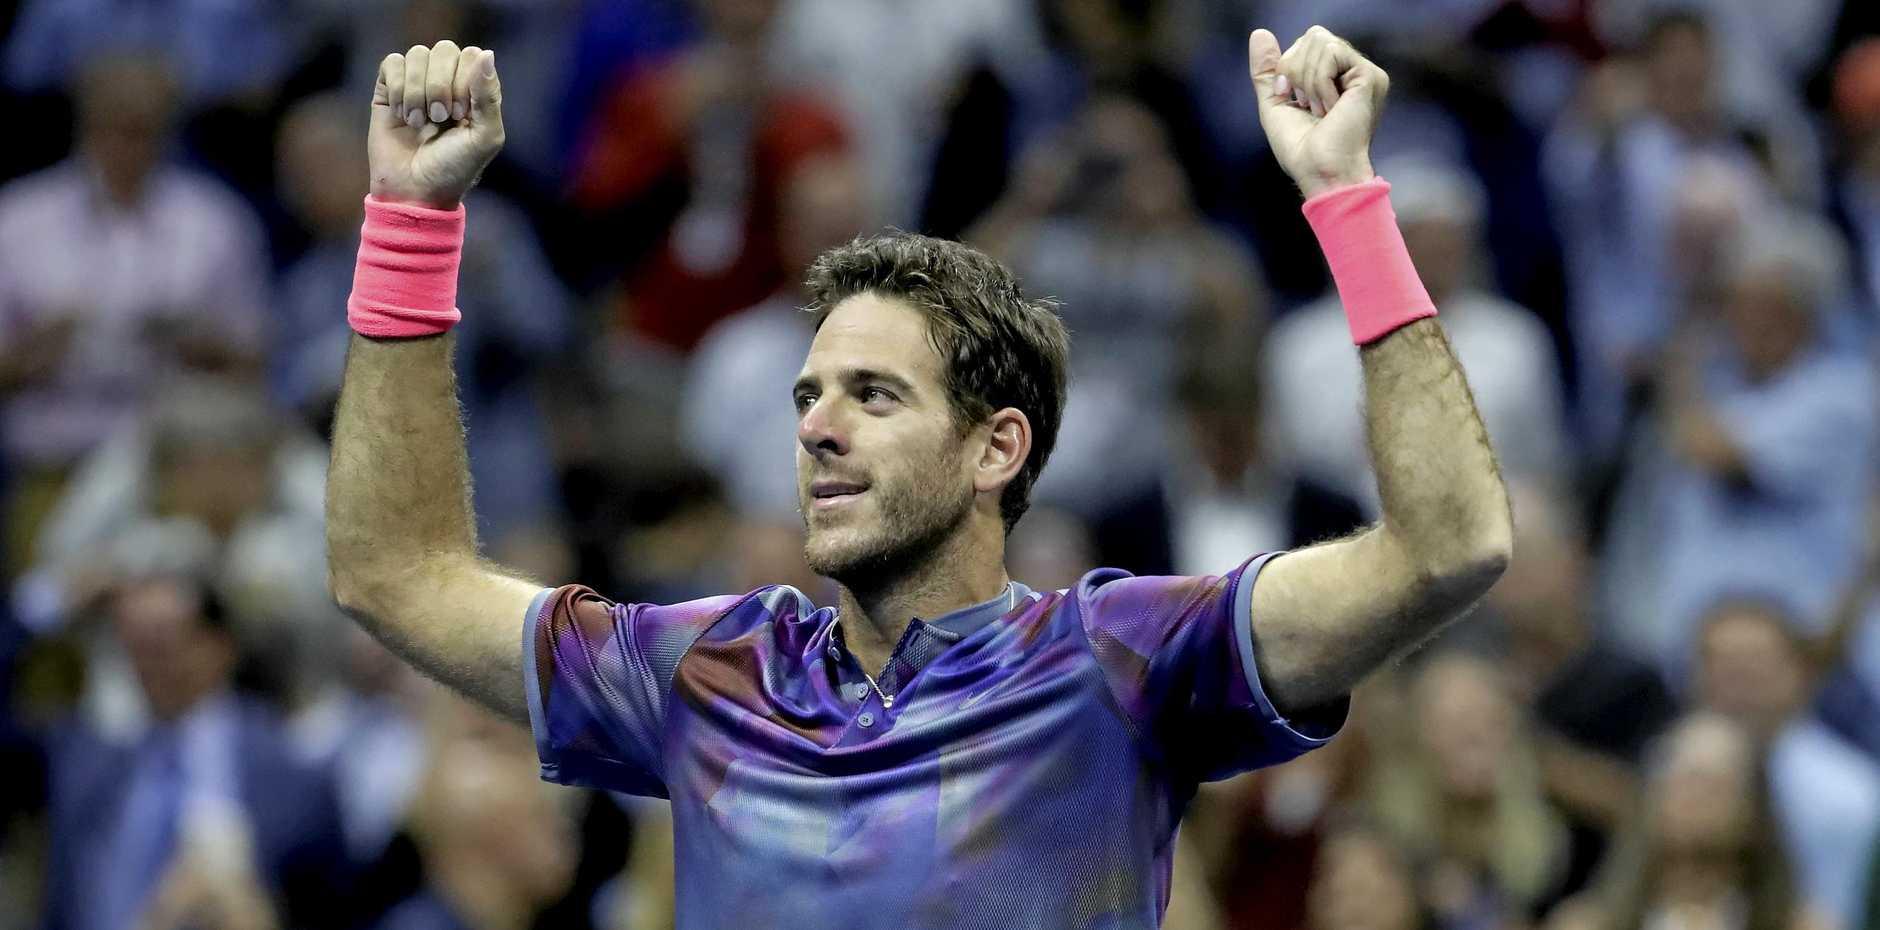 Juan Martin del Potro reacts after defeating Roger Federer.